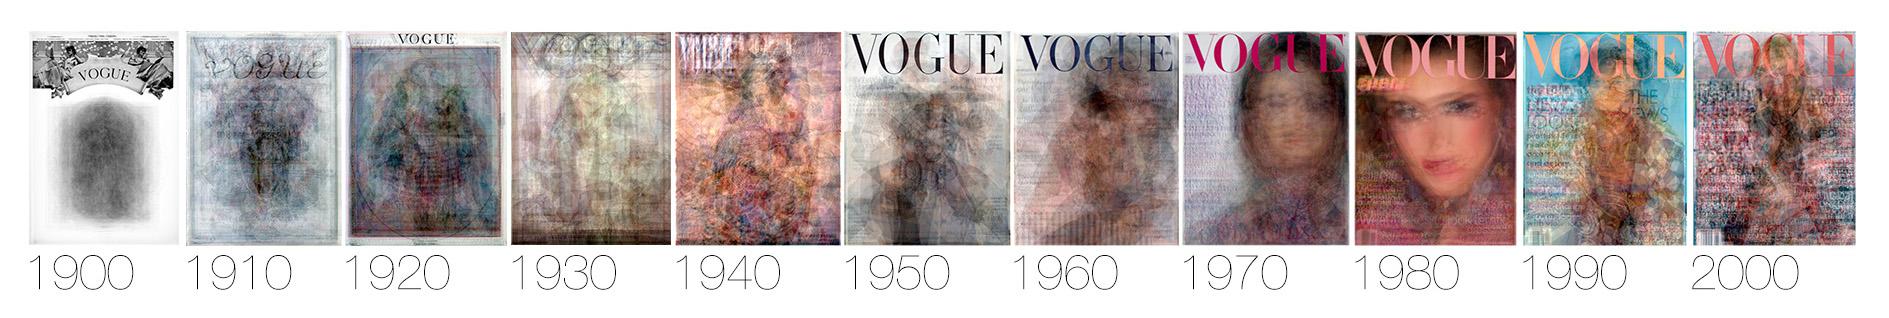 robots reading vogue 1900 - 2010 from yale university